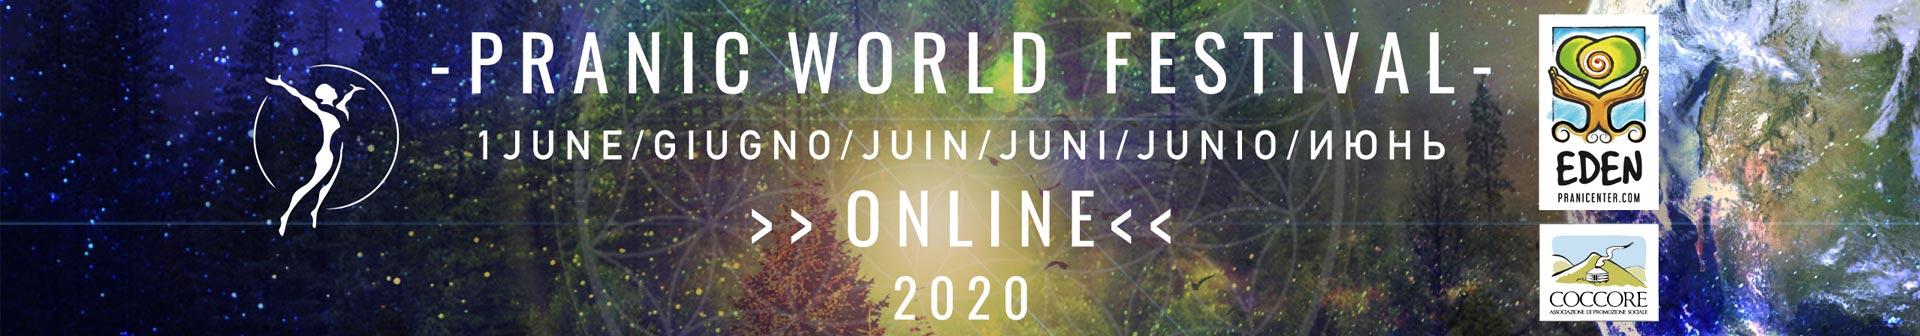 pranic world festival